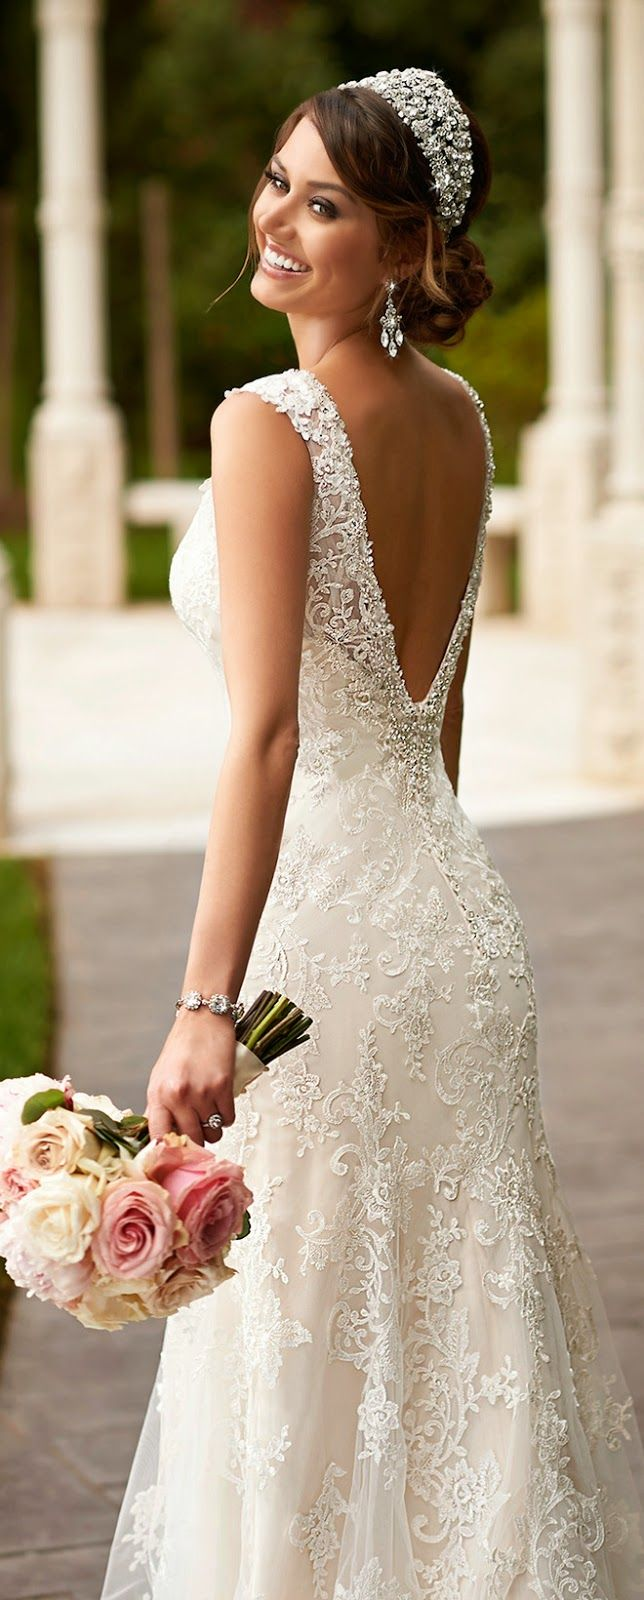 Lace up wedding dress november 2018 Fanny Nonvignon aaliyaheart on Pinterest